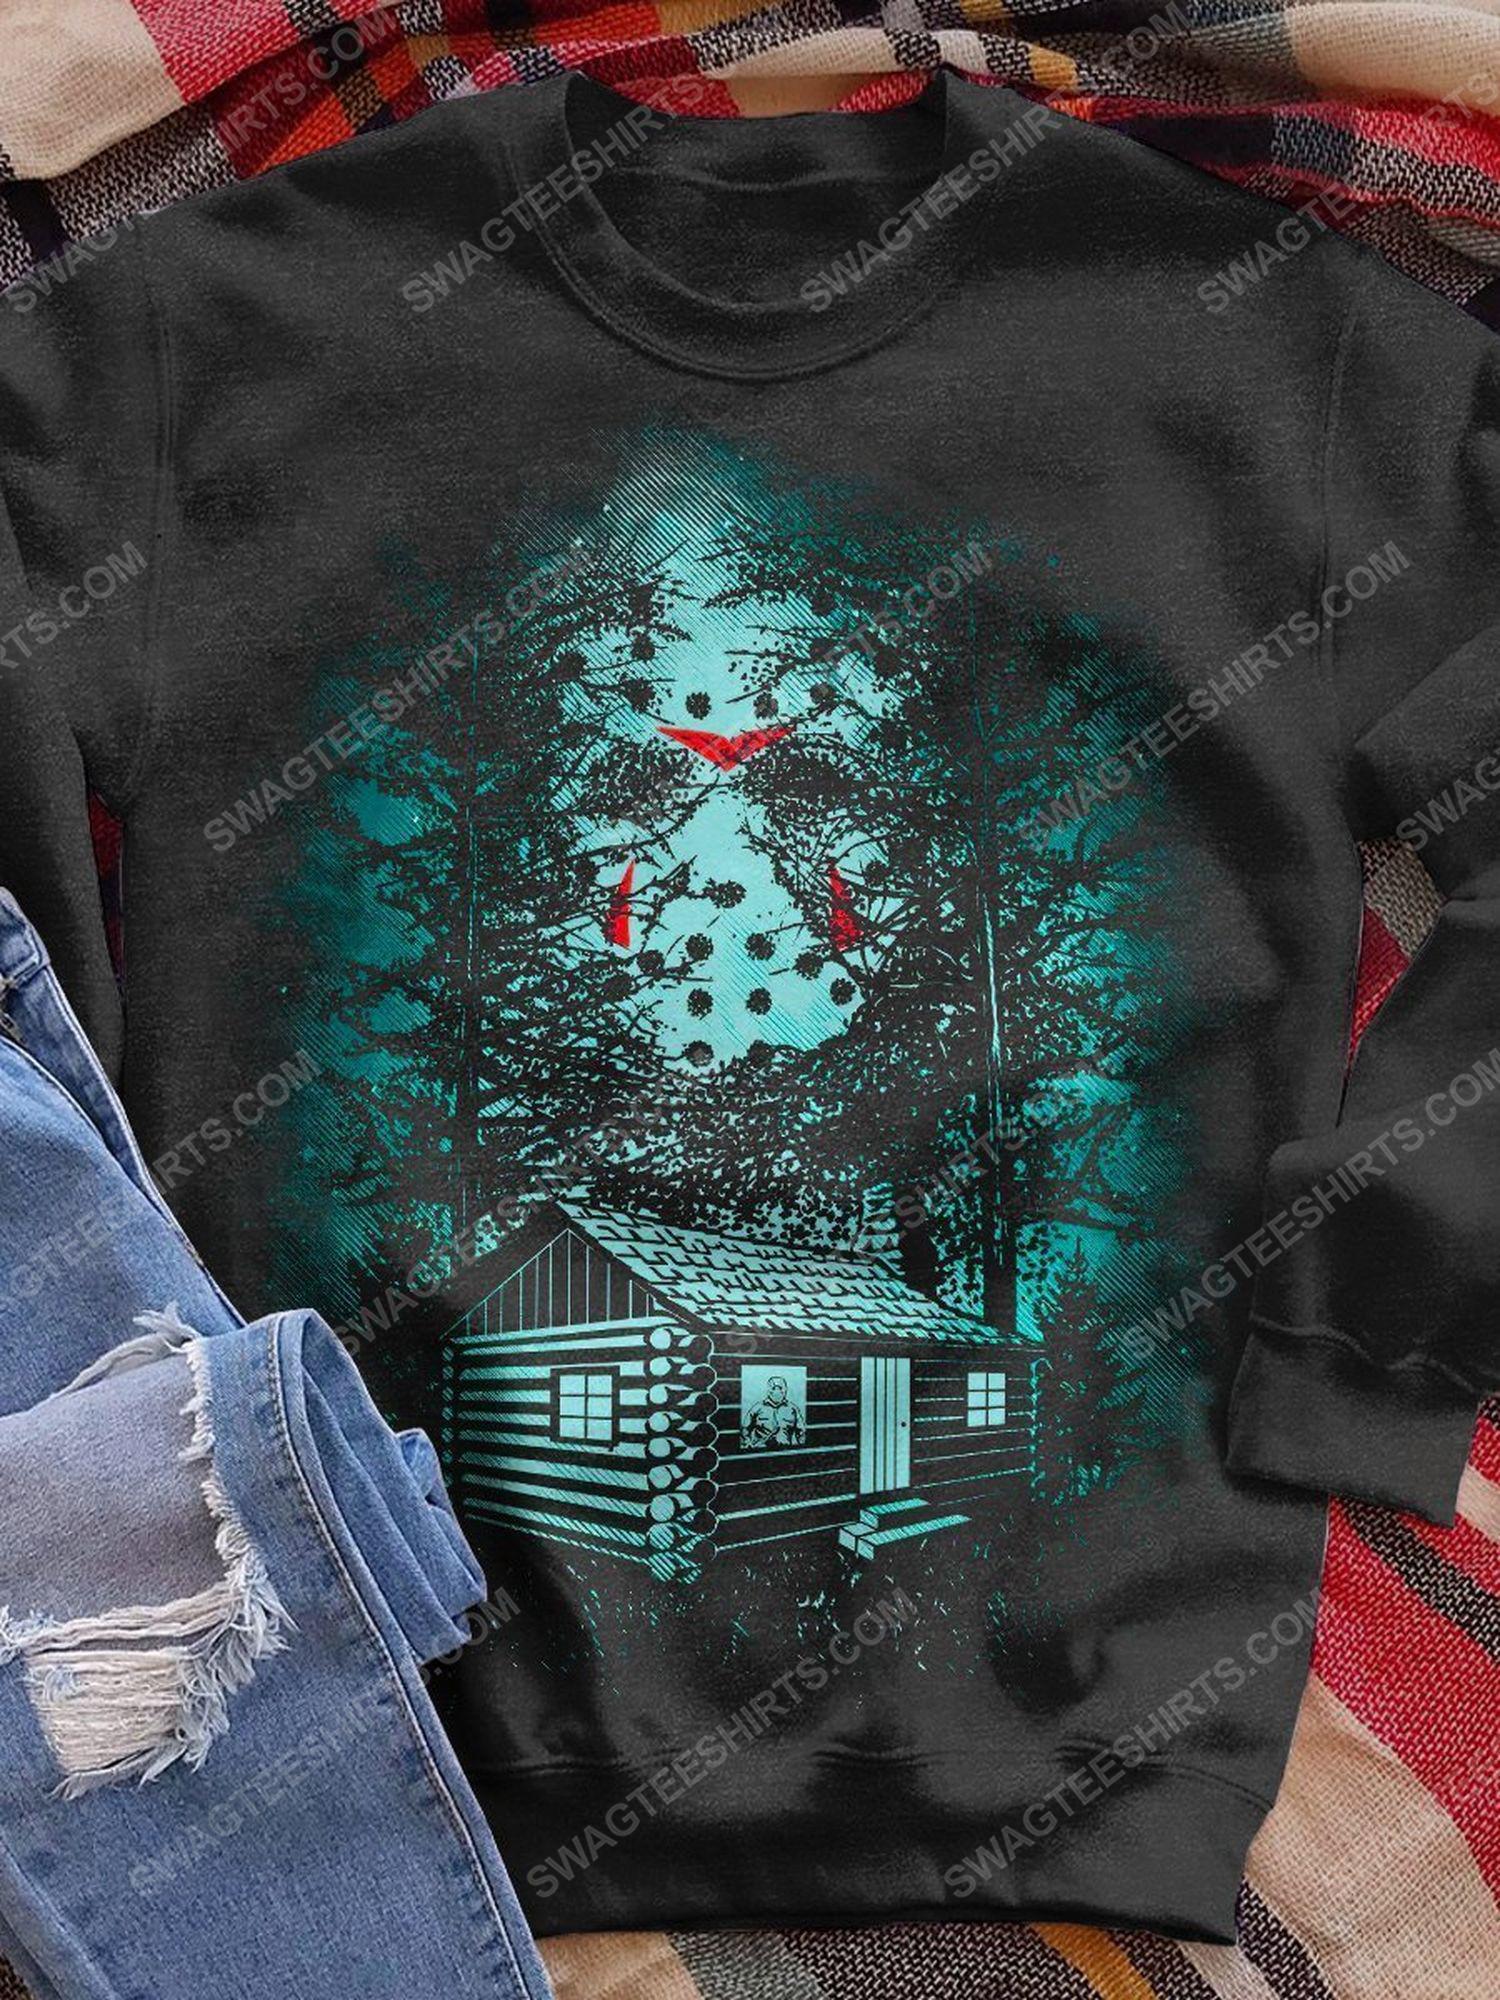 Halloween jason voorhees friday the 13th series shirt 1 - Copy (3)